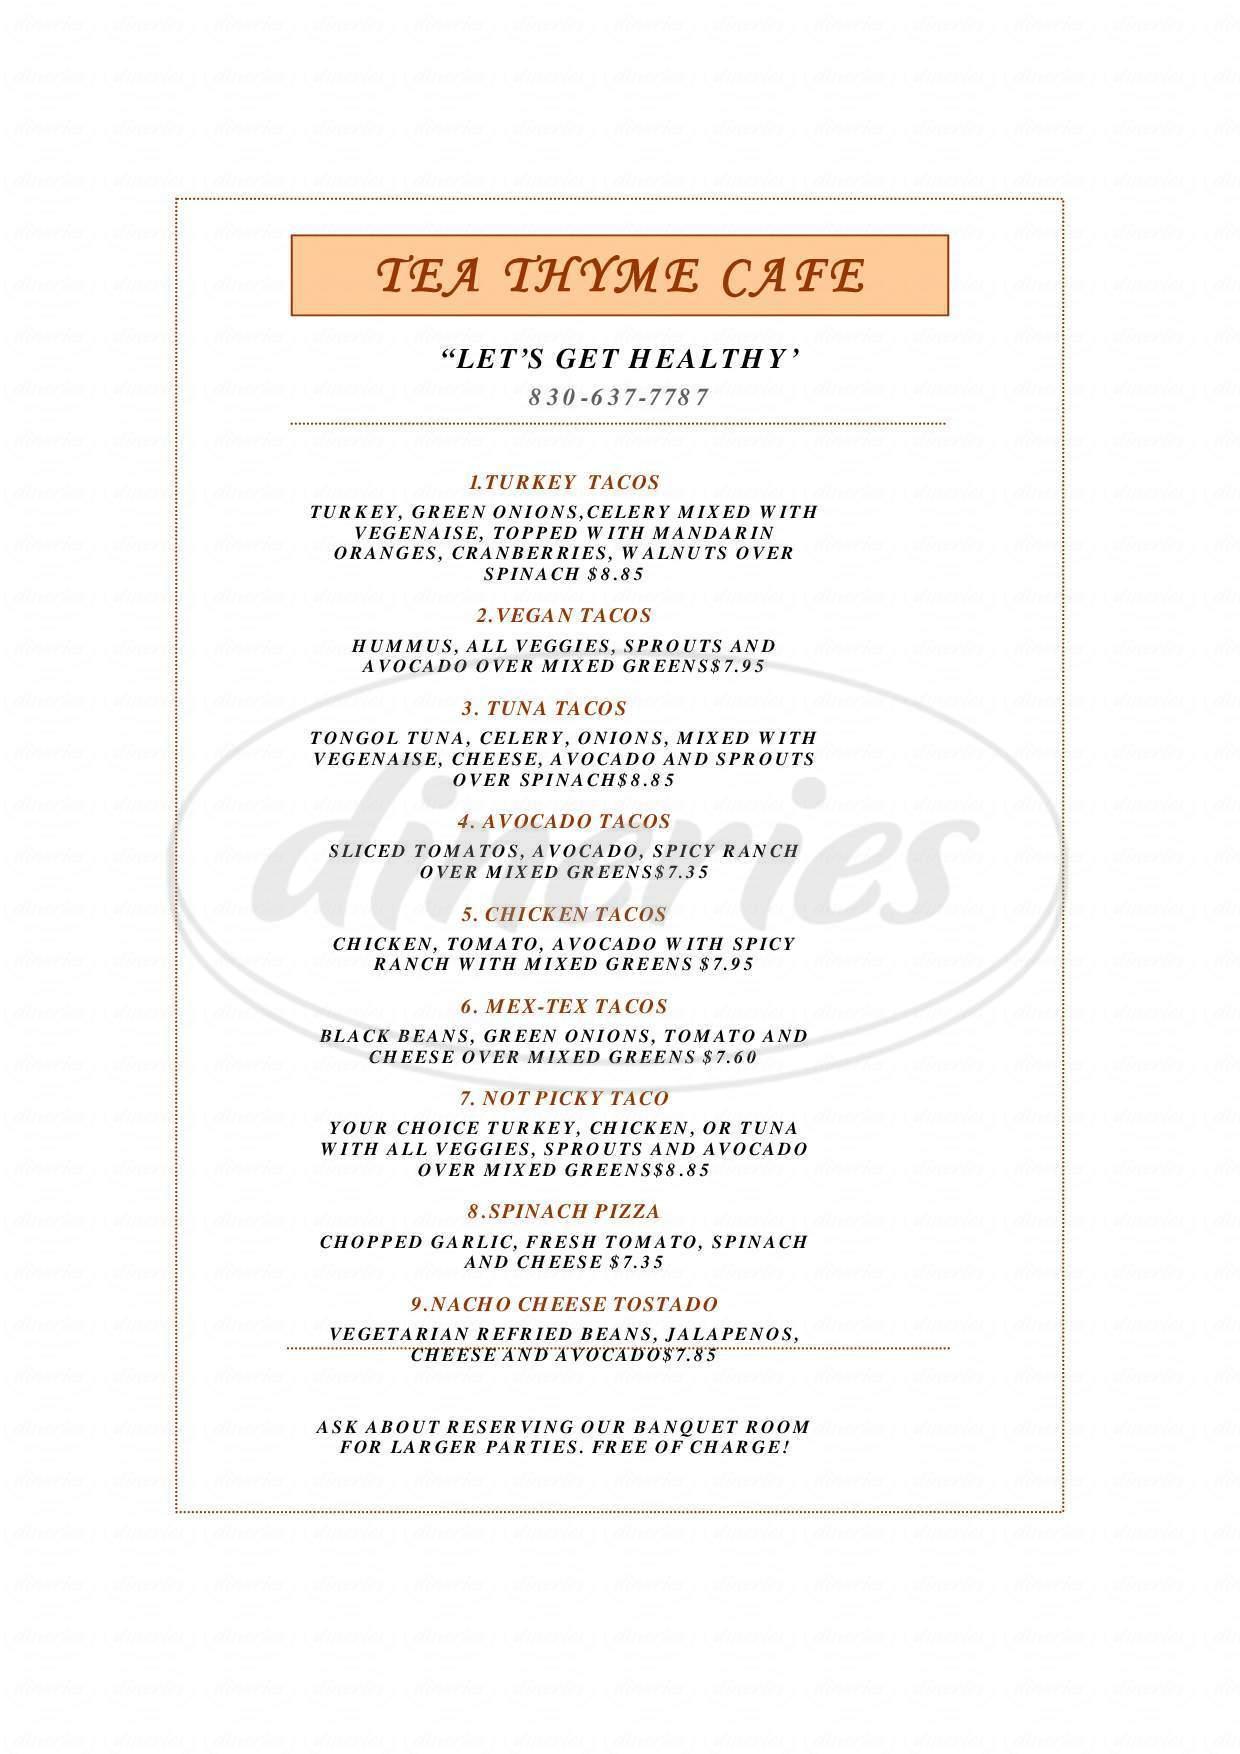 menu for Tea Thyme Cafe